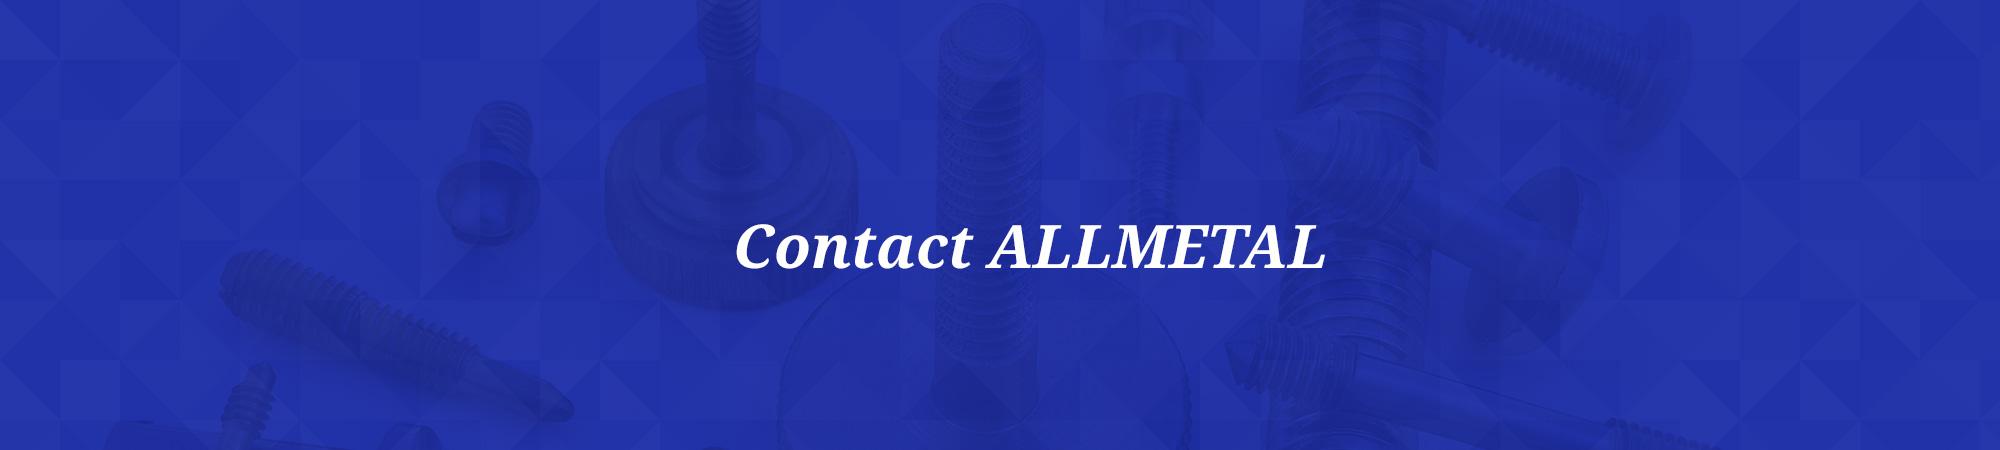 Contact AllMetal